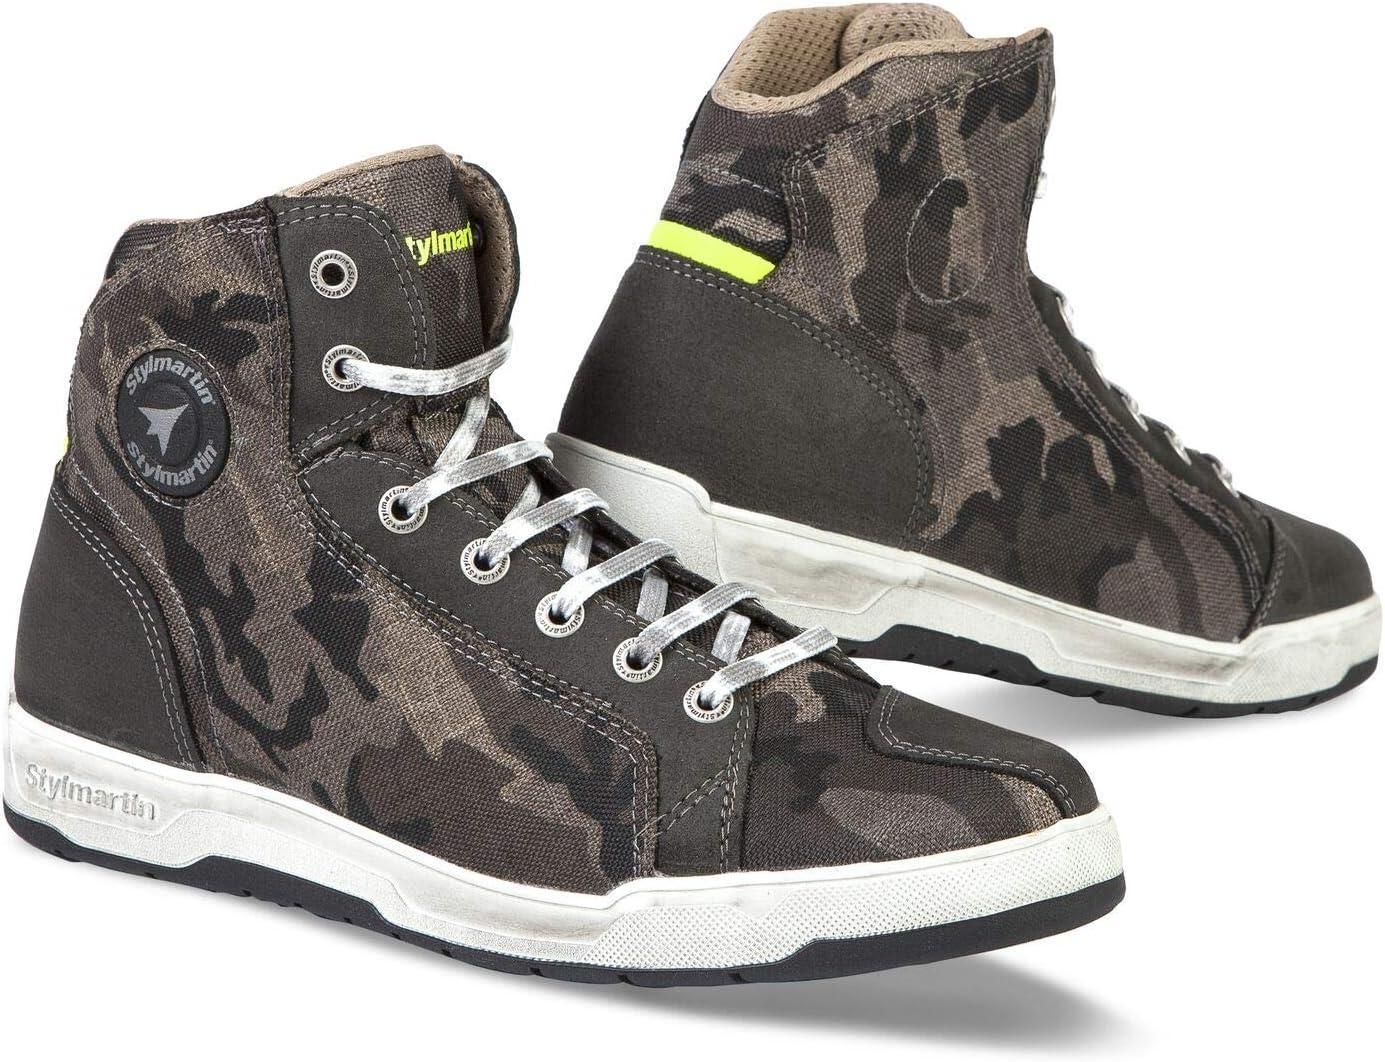 Stylmartin Raptor Evo Sneakers 41